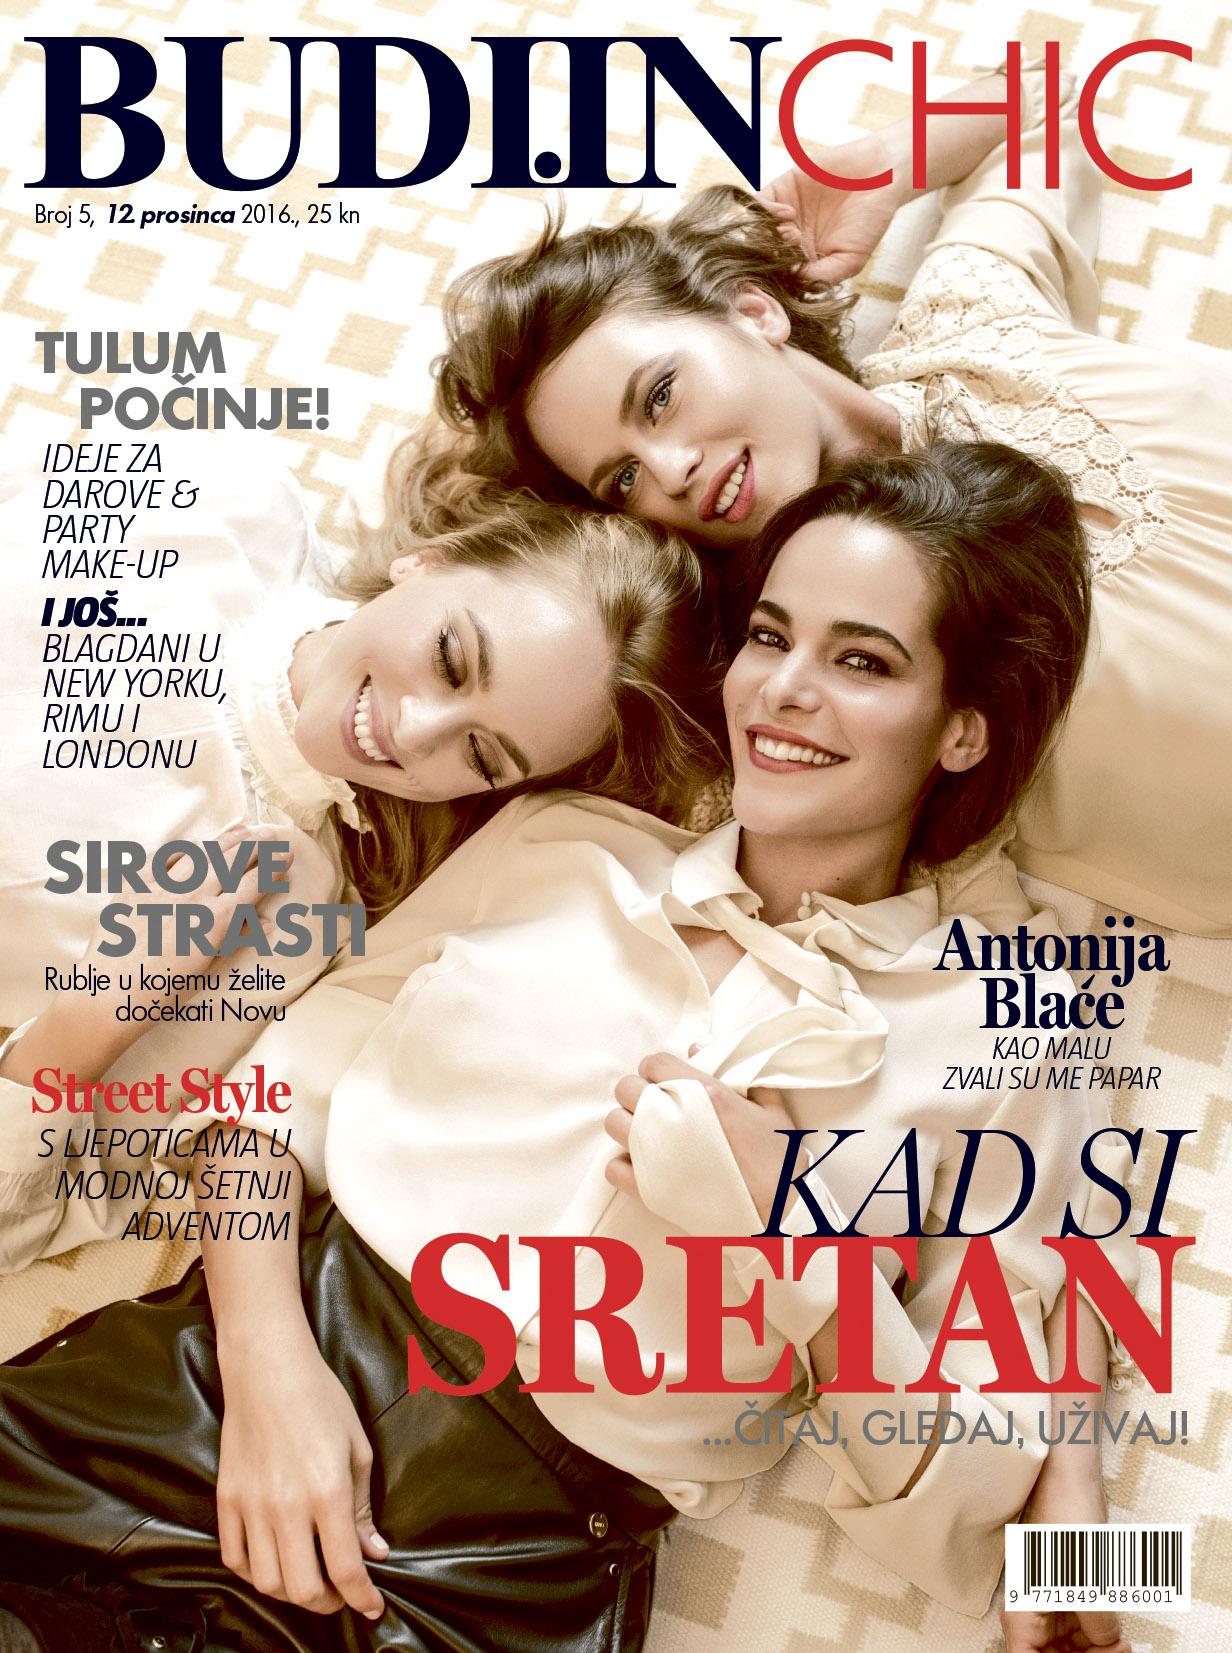 Budi.in - First Croatian Street Style Magazine